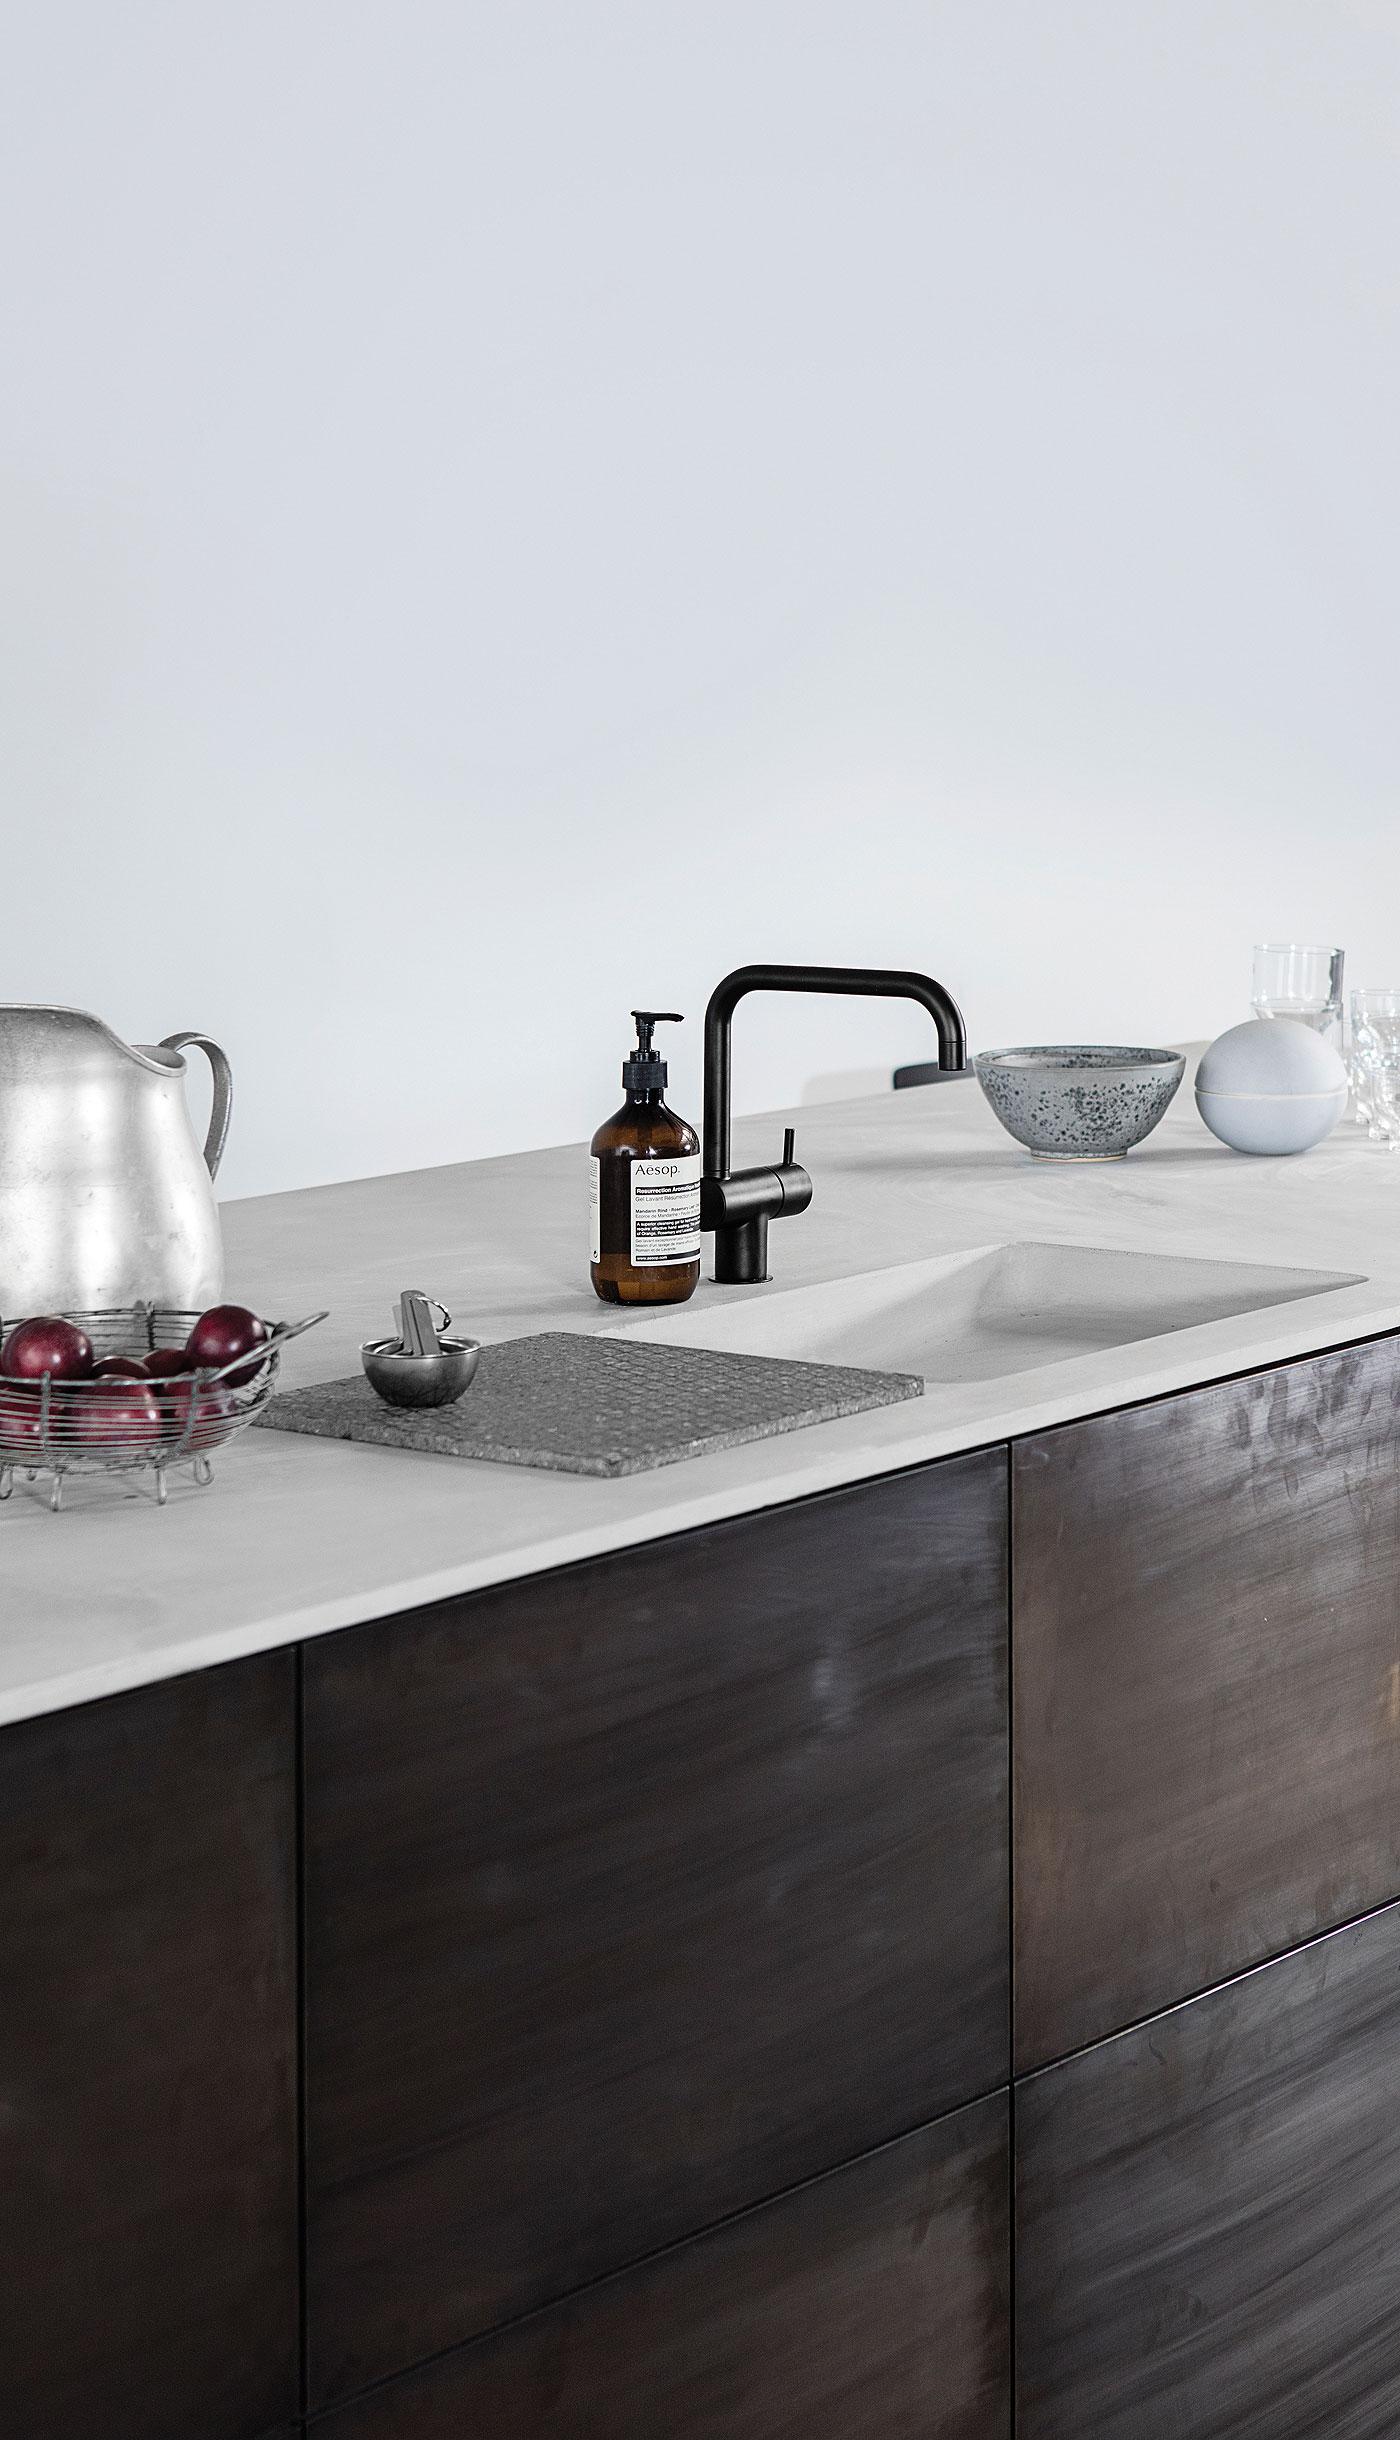 cocina-reform-norm-architects (3)